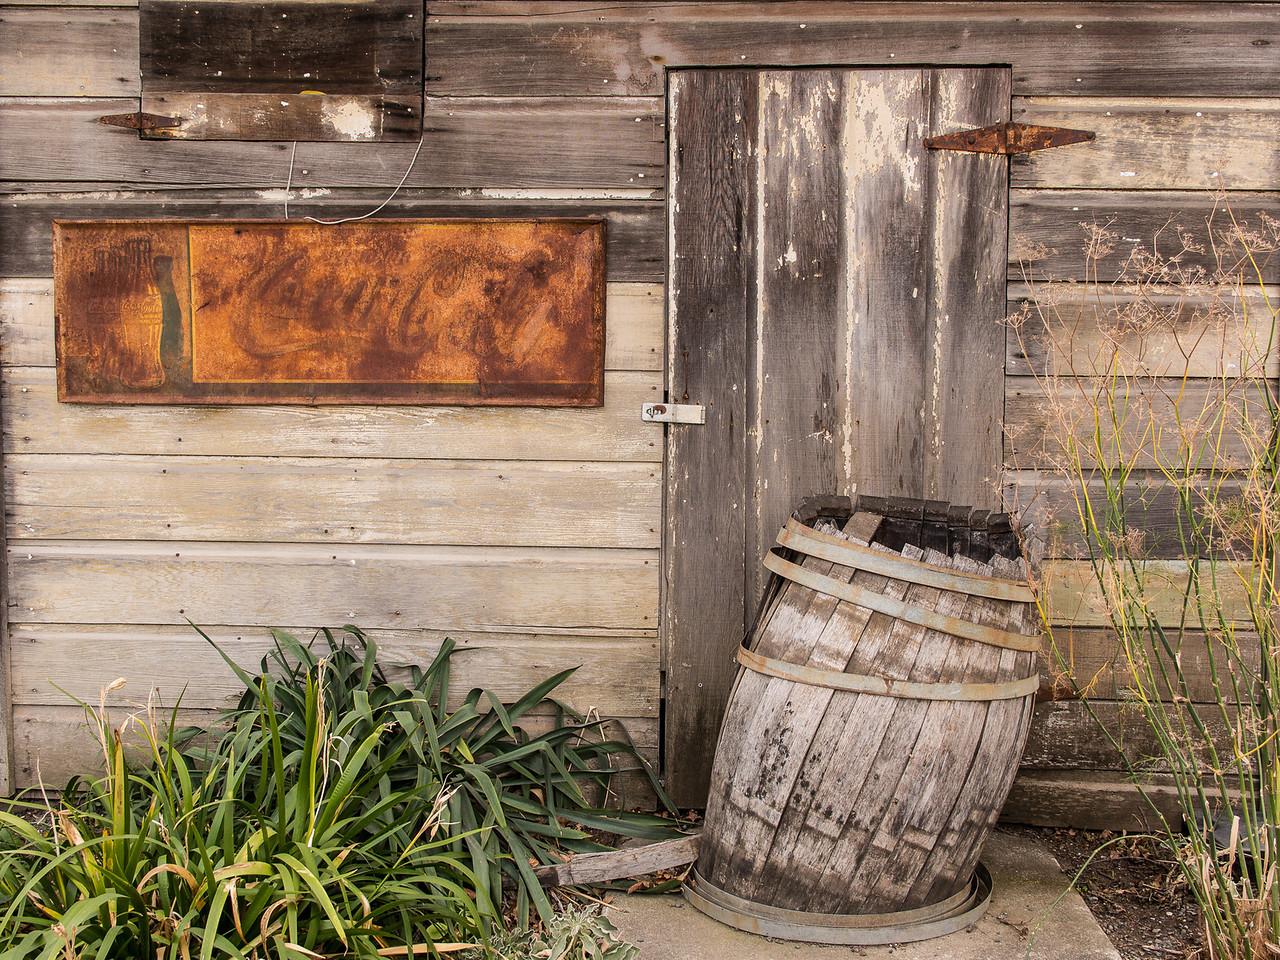 Old Door, Rusted Coca-Cola Sign and Delapidated Wooden Barrel